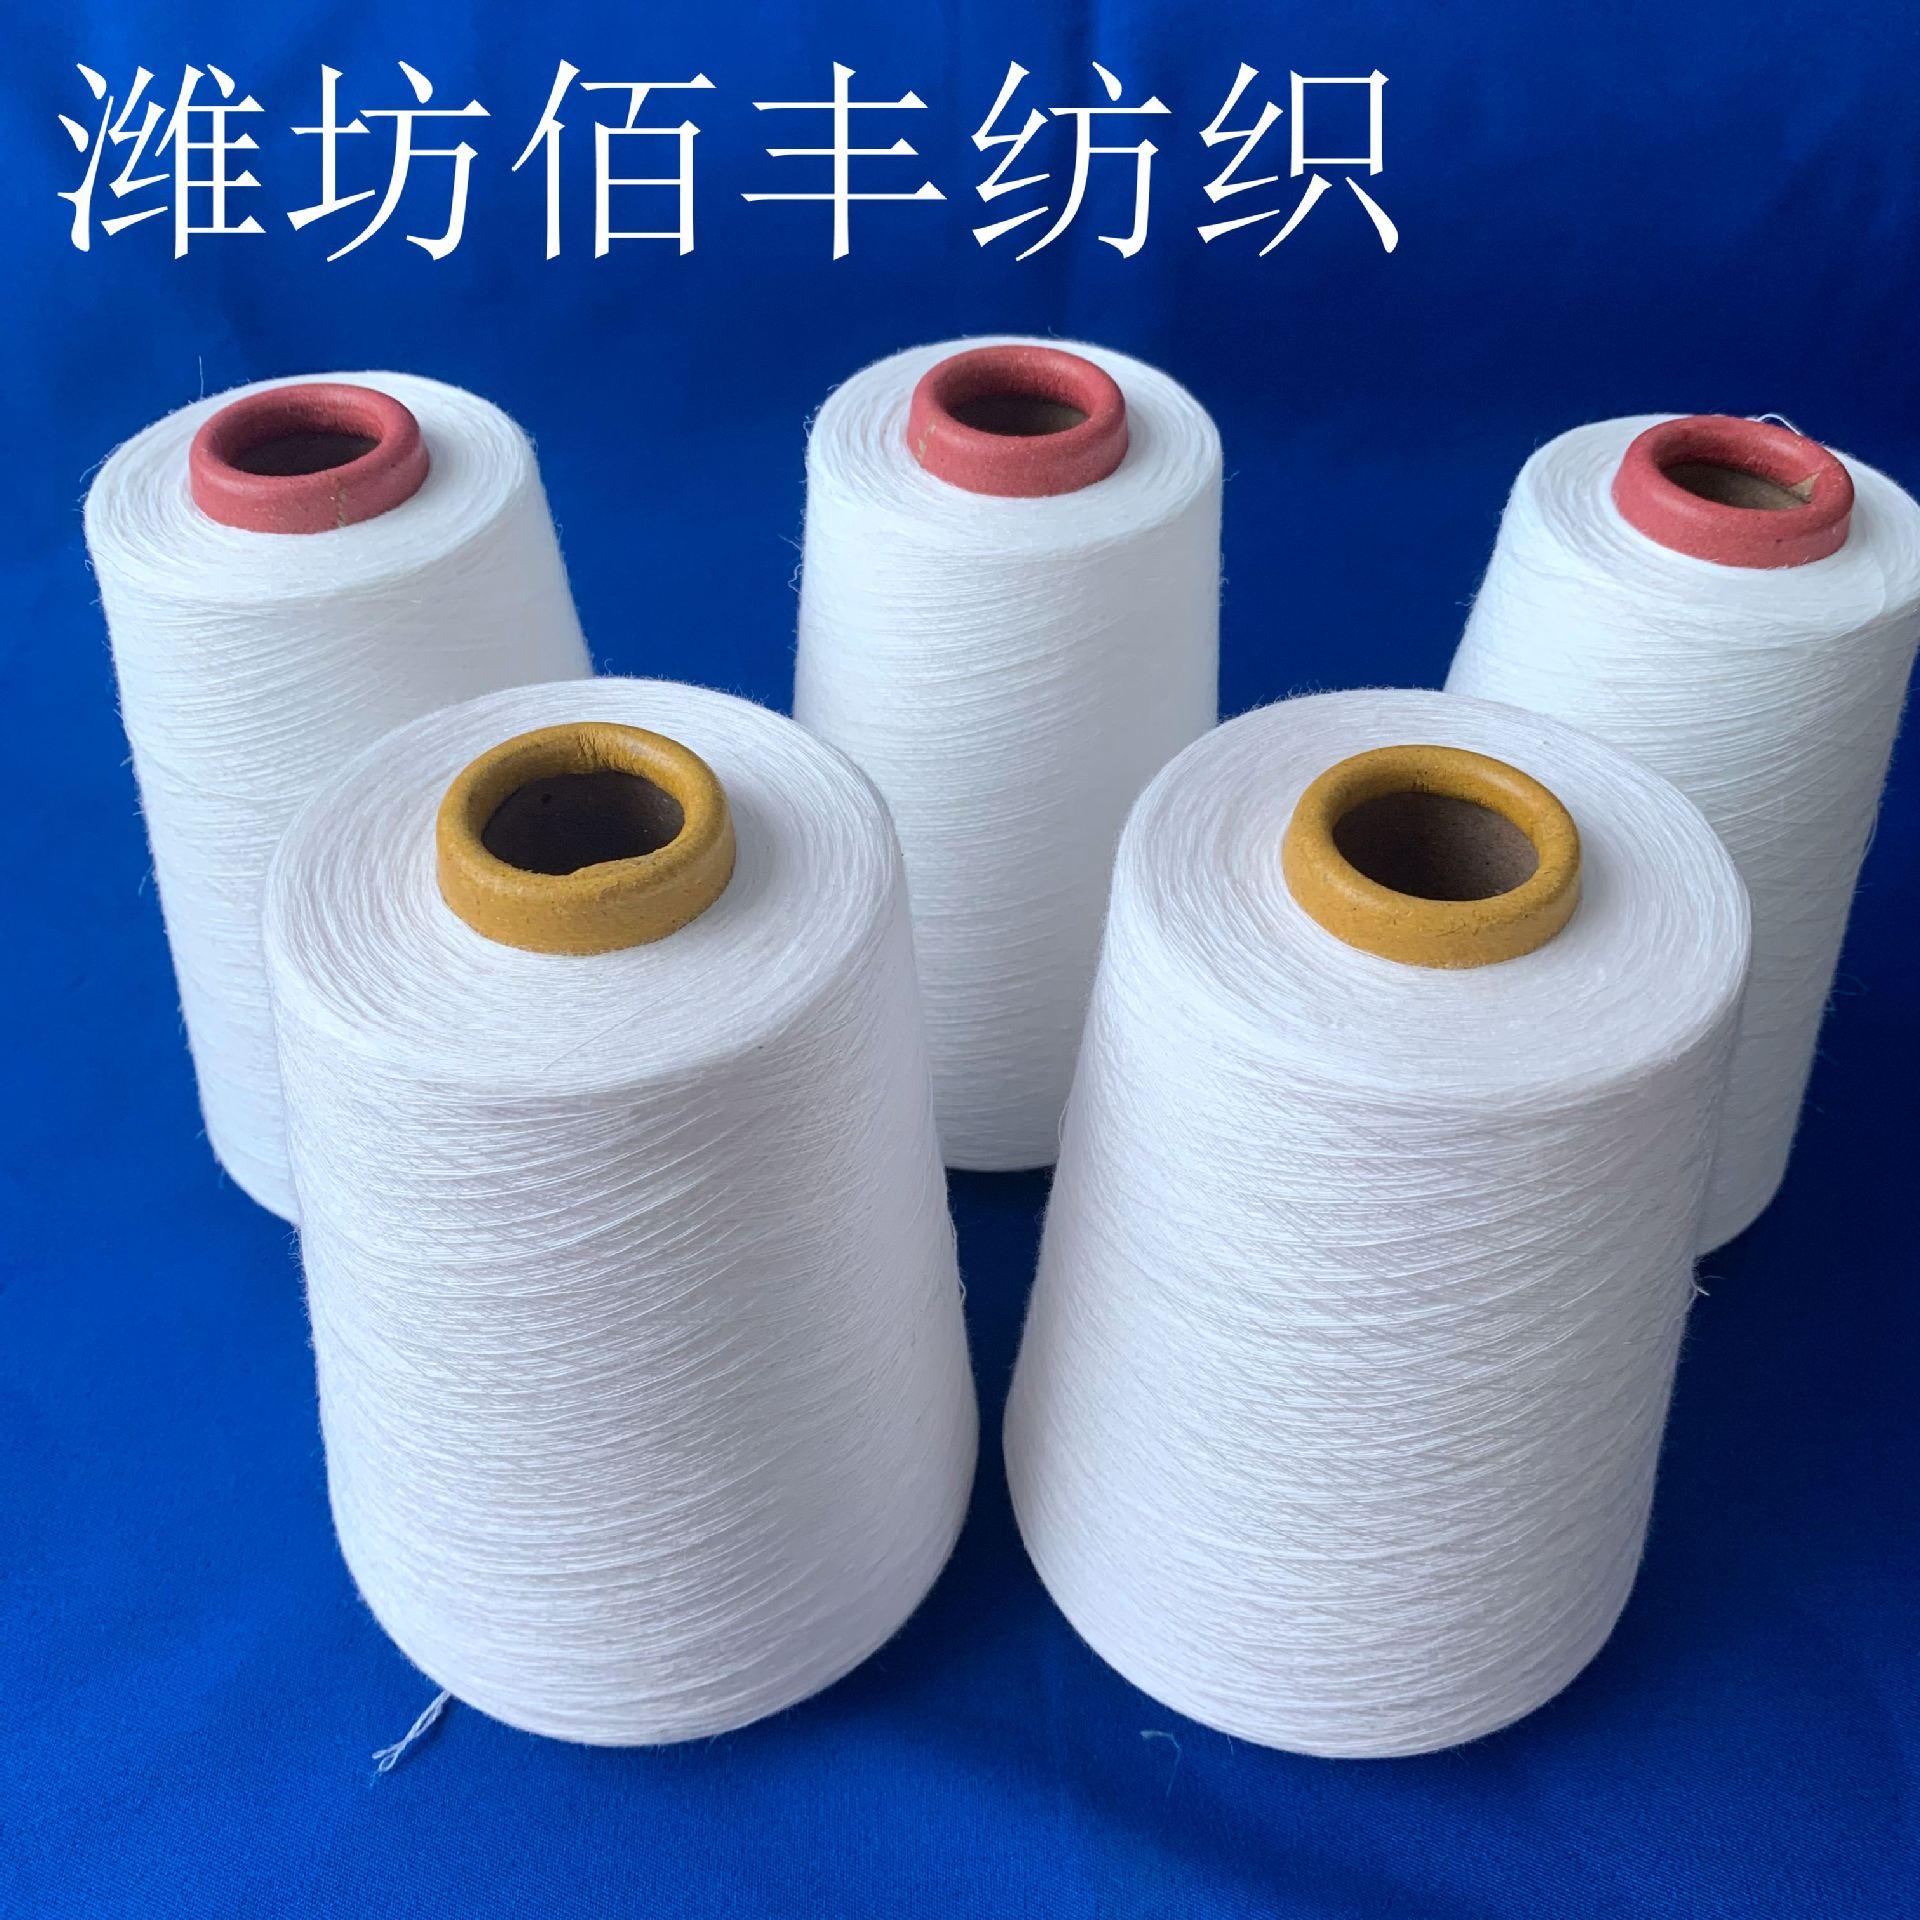 BAIFENG Polyester flame-retardant yarn 21 counts flame-retardant yarn Textile supply cone yarn Pure